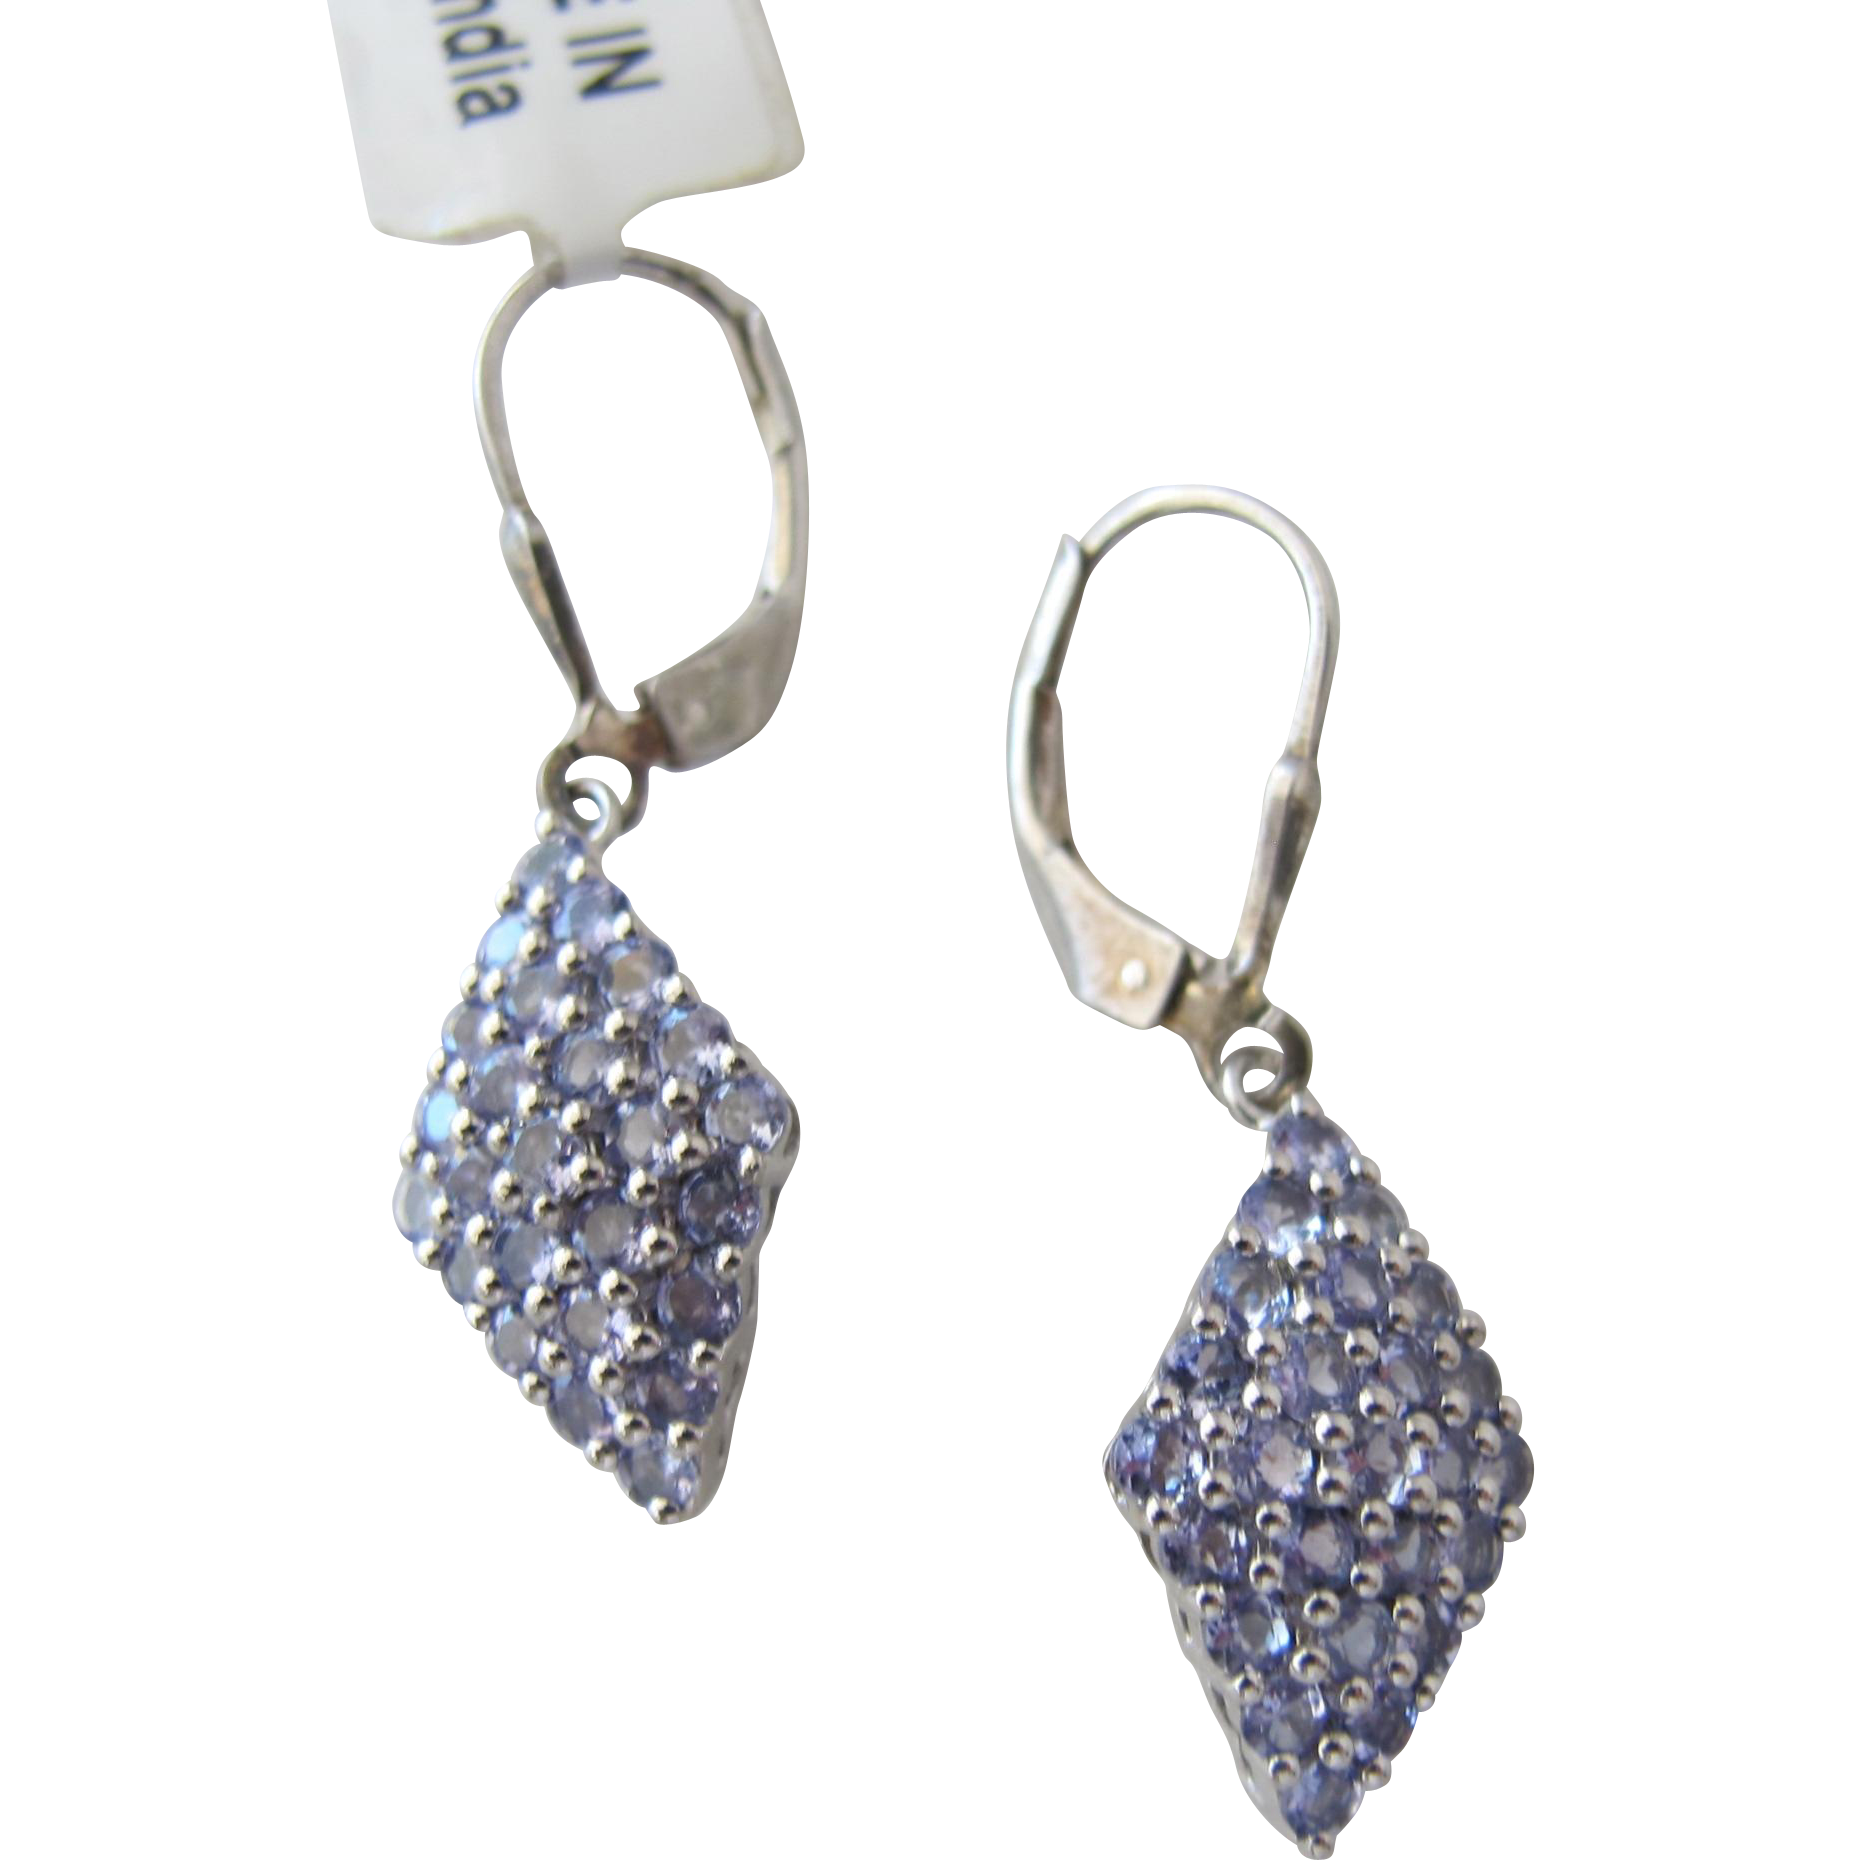 Amethyst  Earrings Gemstones in Diamond Shape Sterling Silver Never Worn